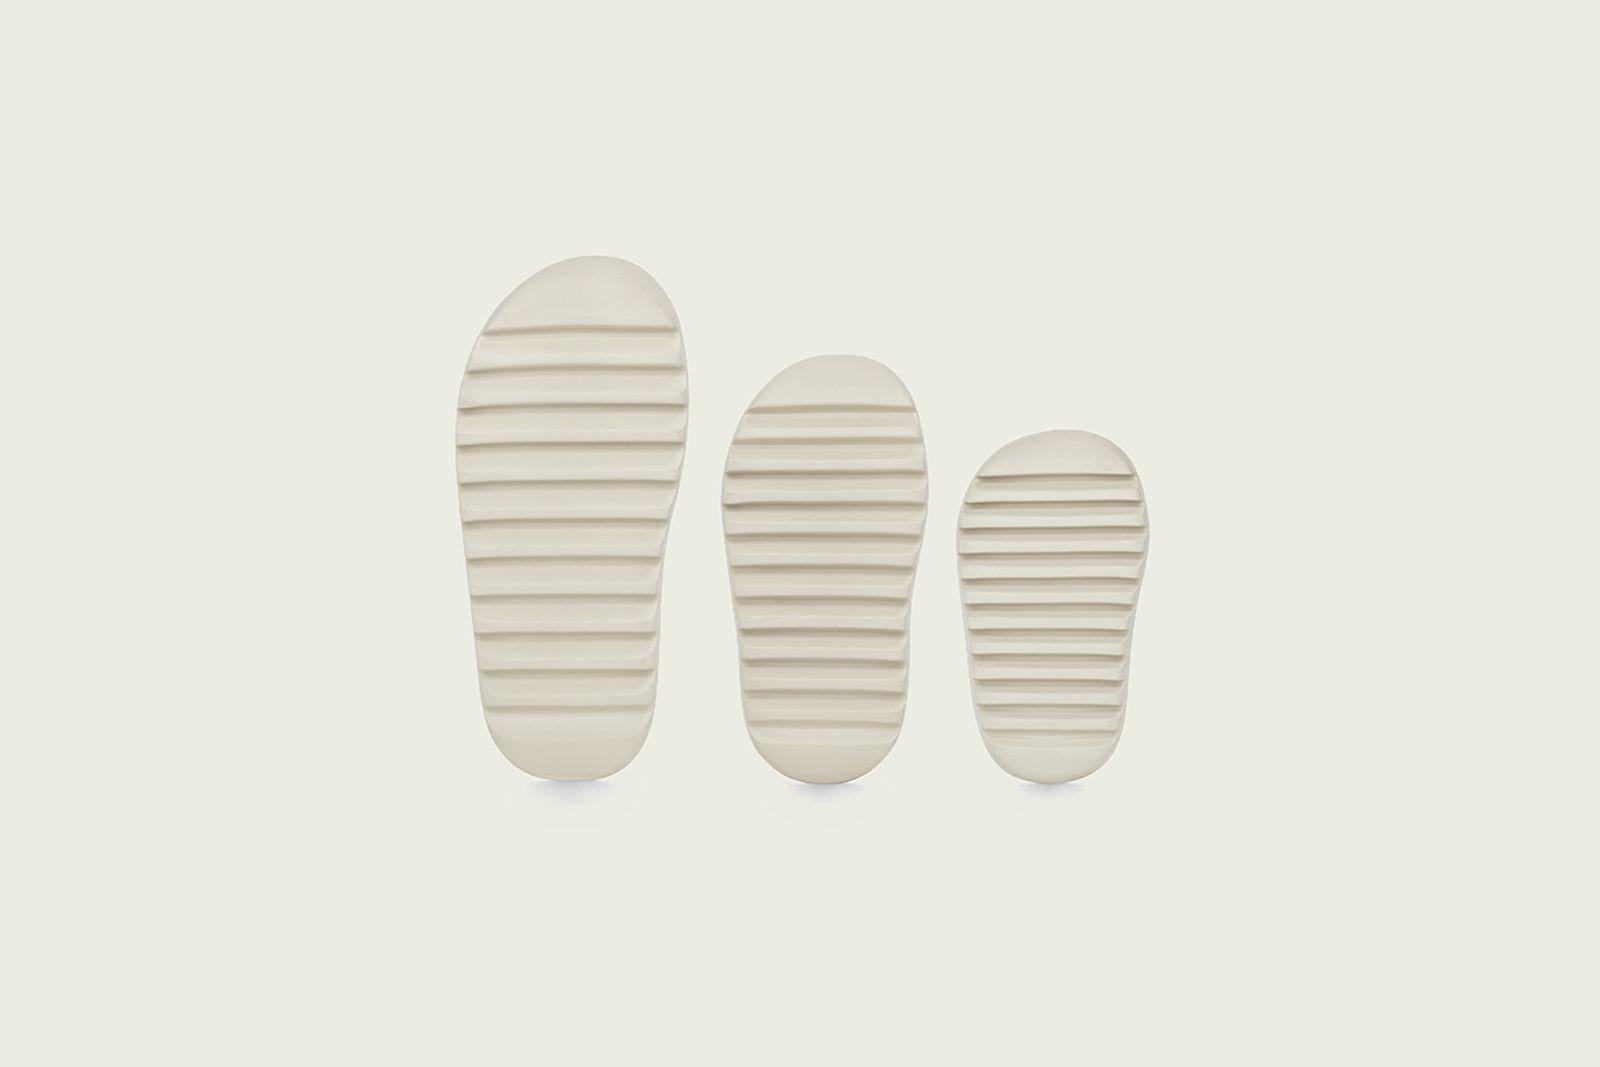 adidas-yeezy-slide-release-date-price-02